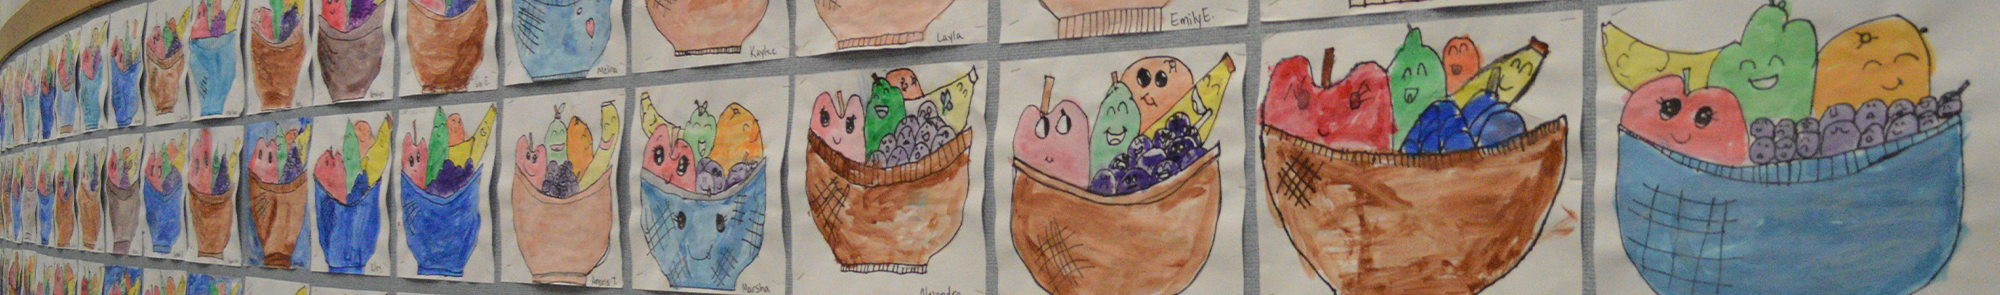 multiple student fruit basket artwork pieces displayed on the bulletin board